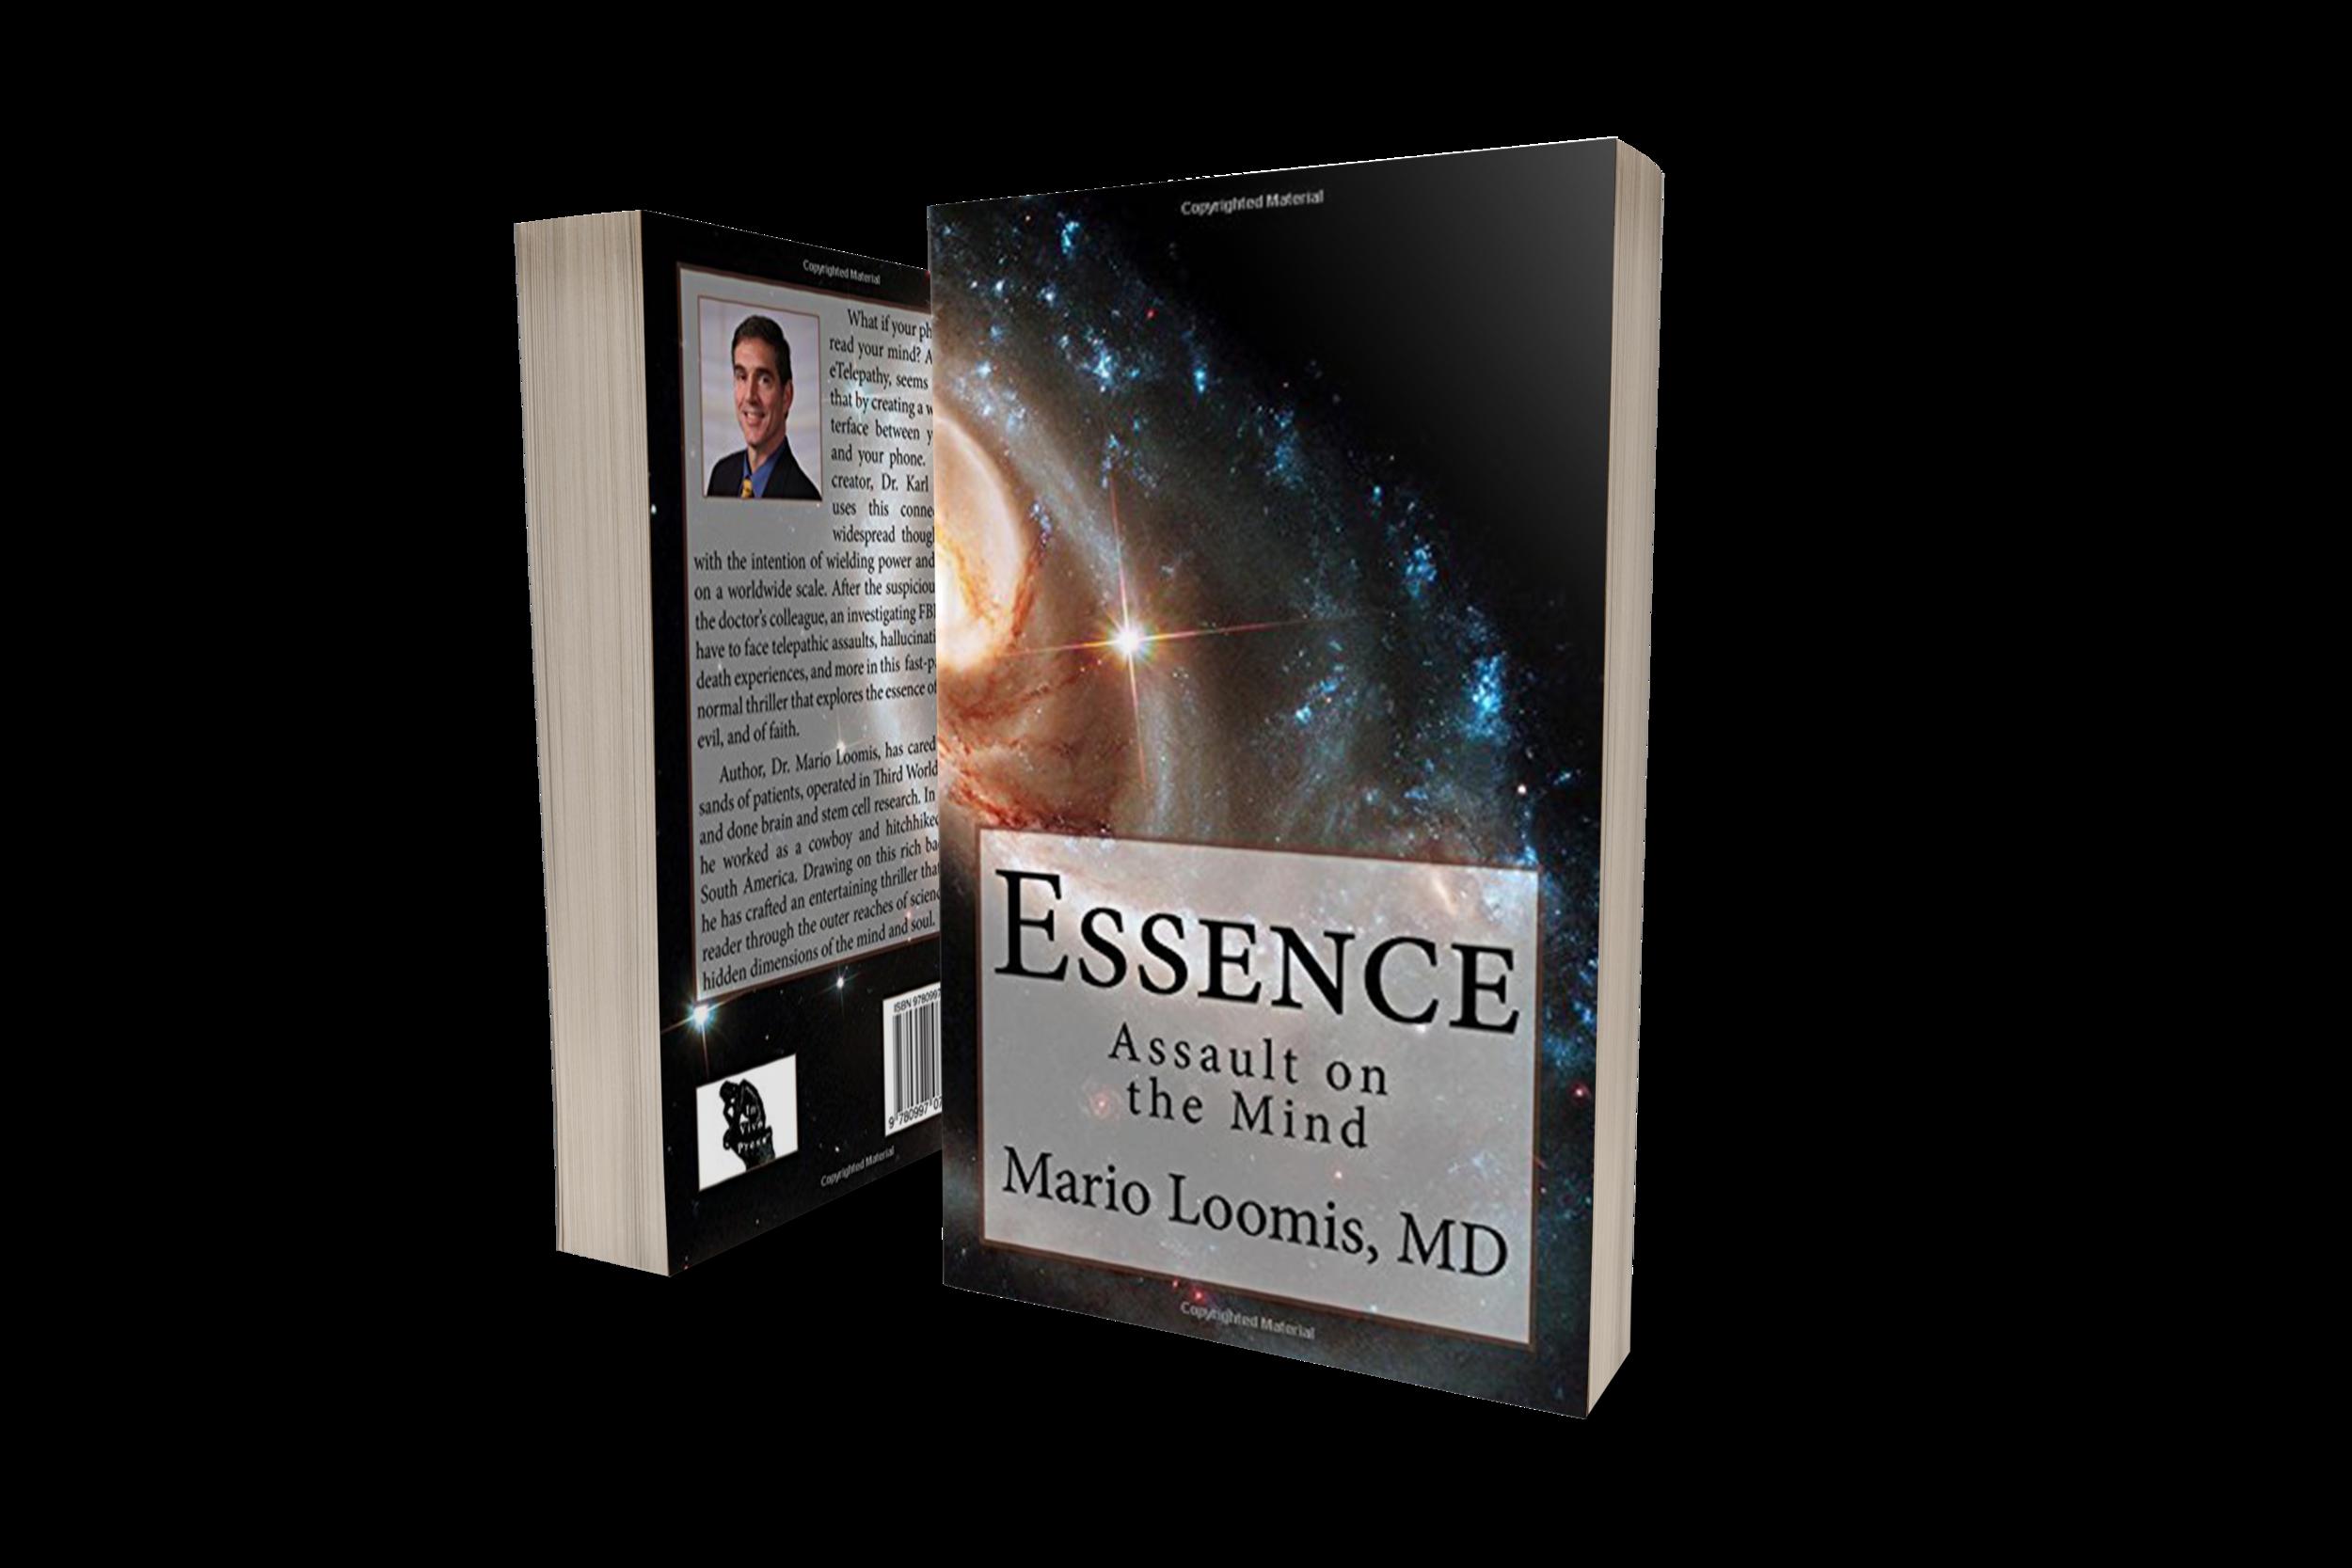 essence-paperback